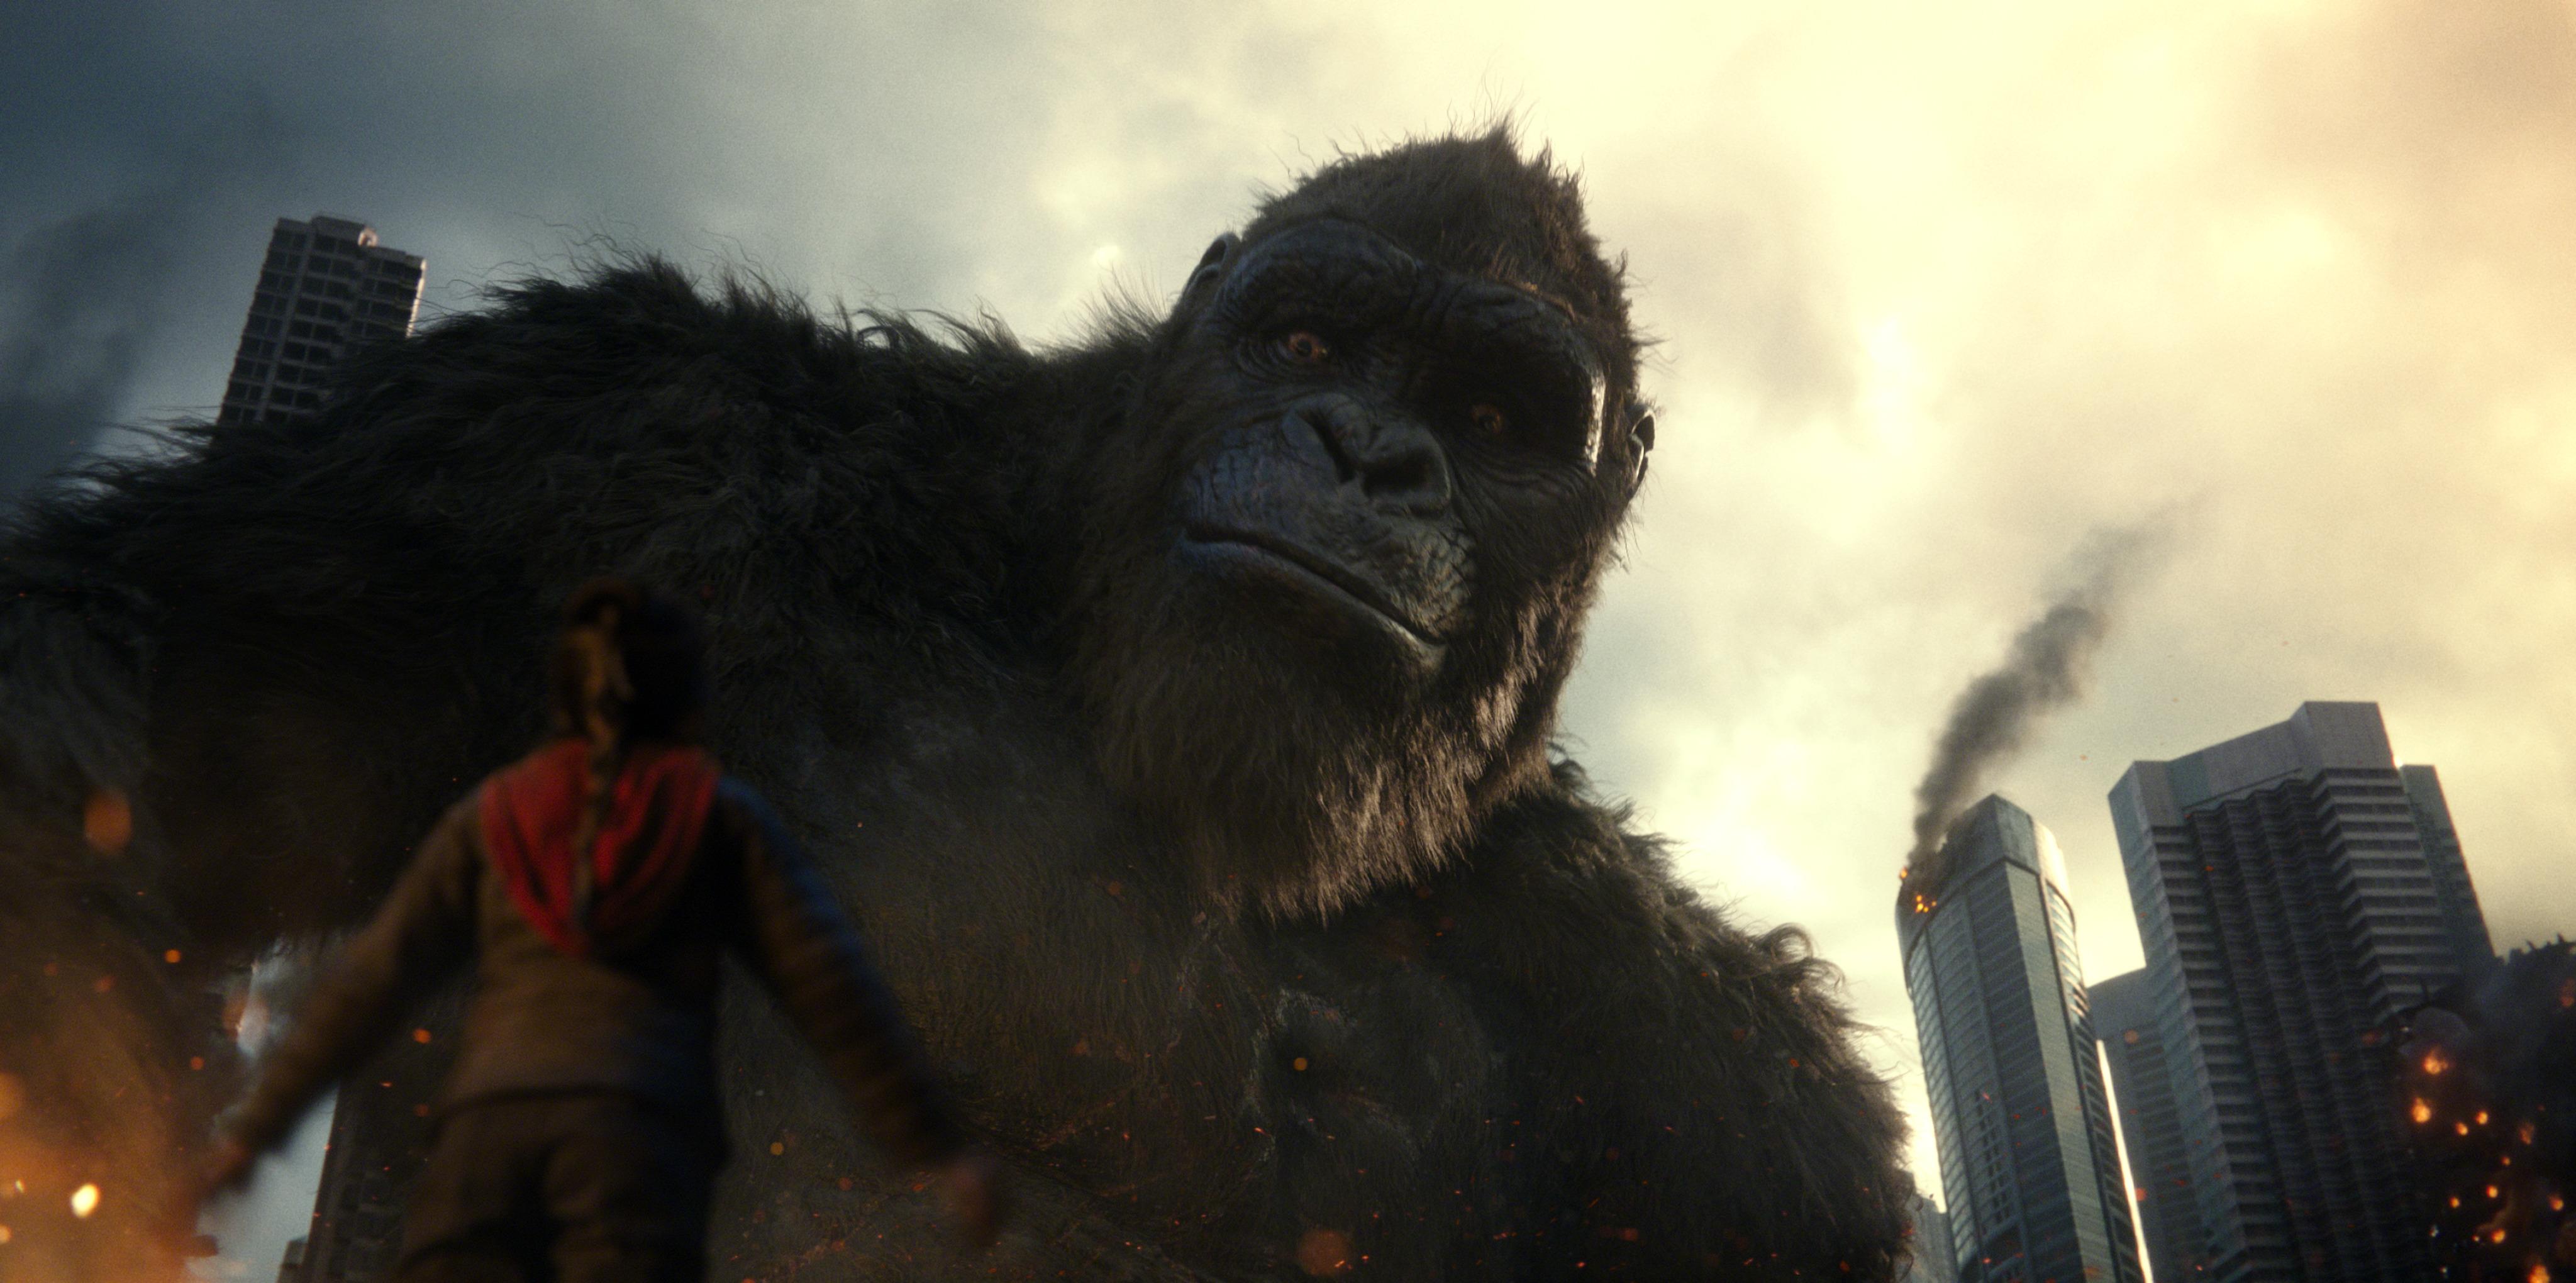 godzilla vs kong still 4k 1618166839 - Godzilla Vs Kong Still 4k - Godzilla Vs Kong Still 4k wallpapers